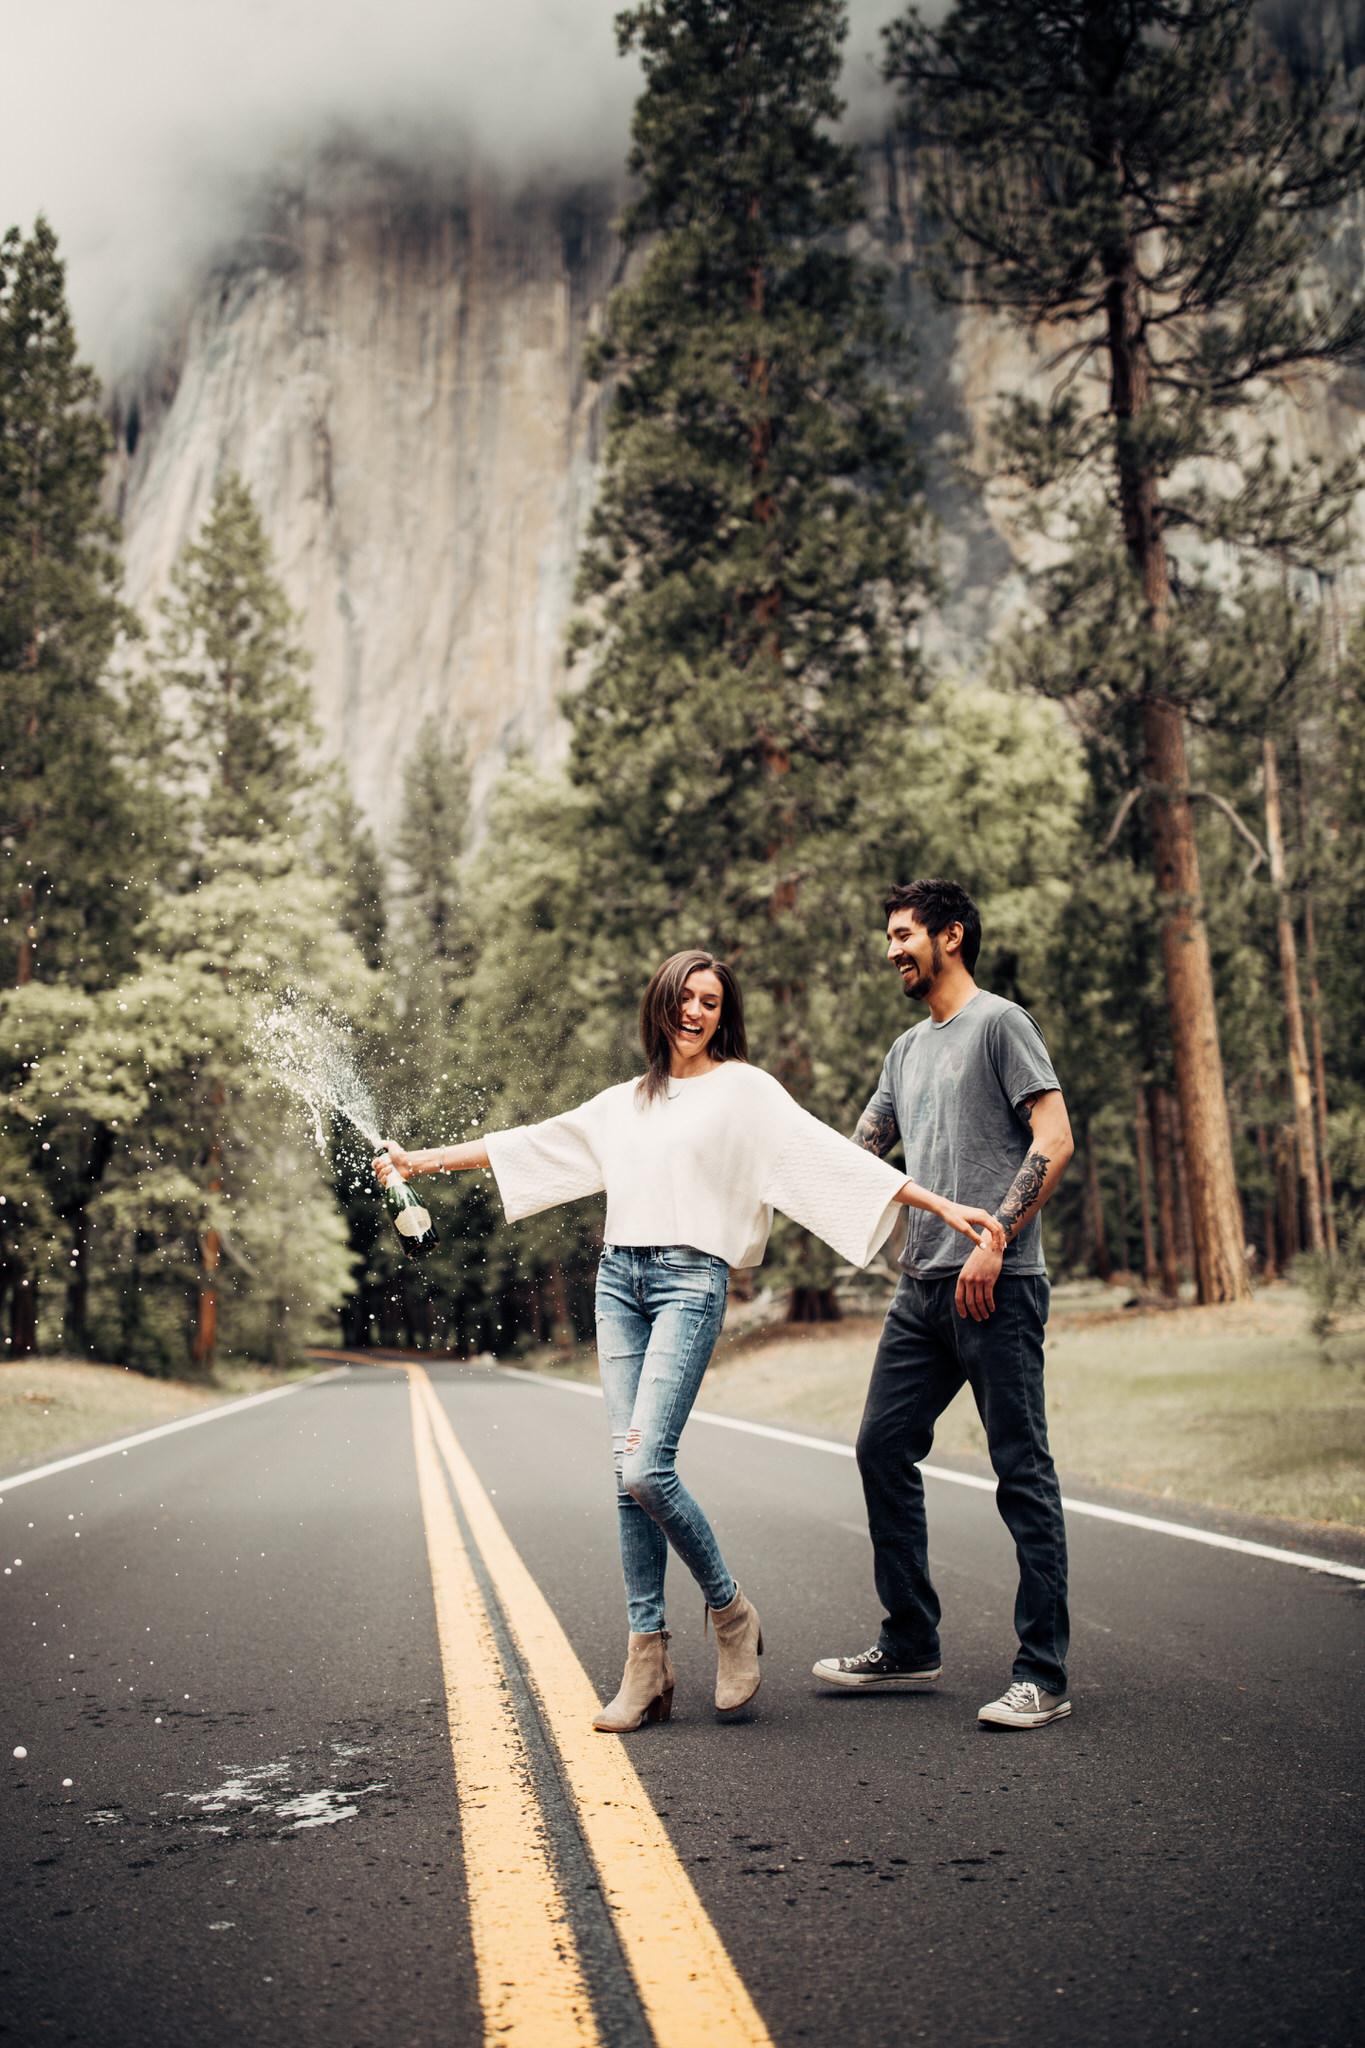 Yosemite-engagement-session-lauren-and-tom96.jpg